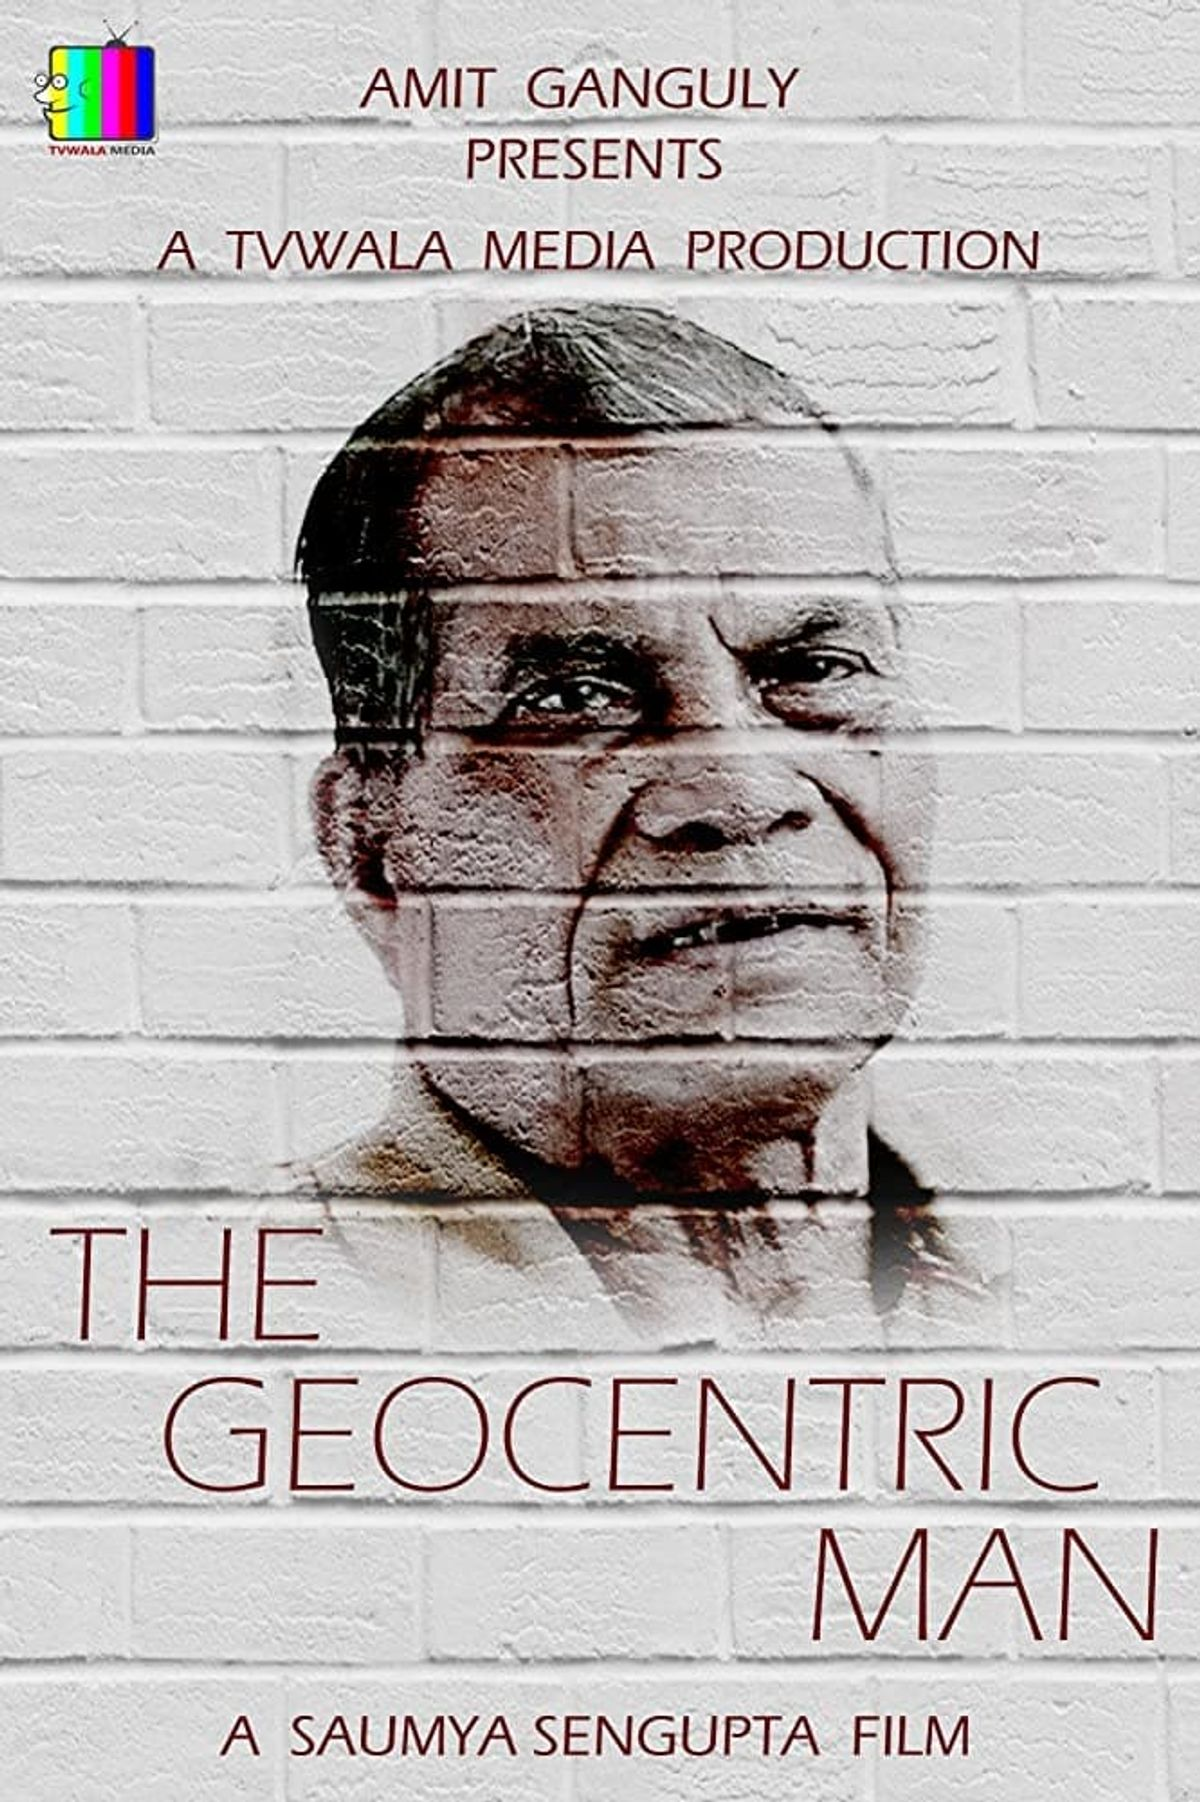 The Geocentric Man (দি জিওসেন্ট্রিক ম্যান)